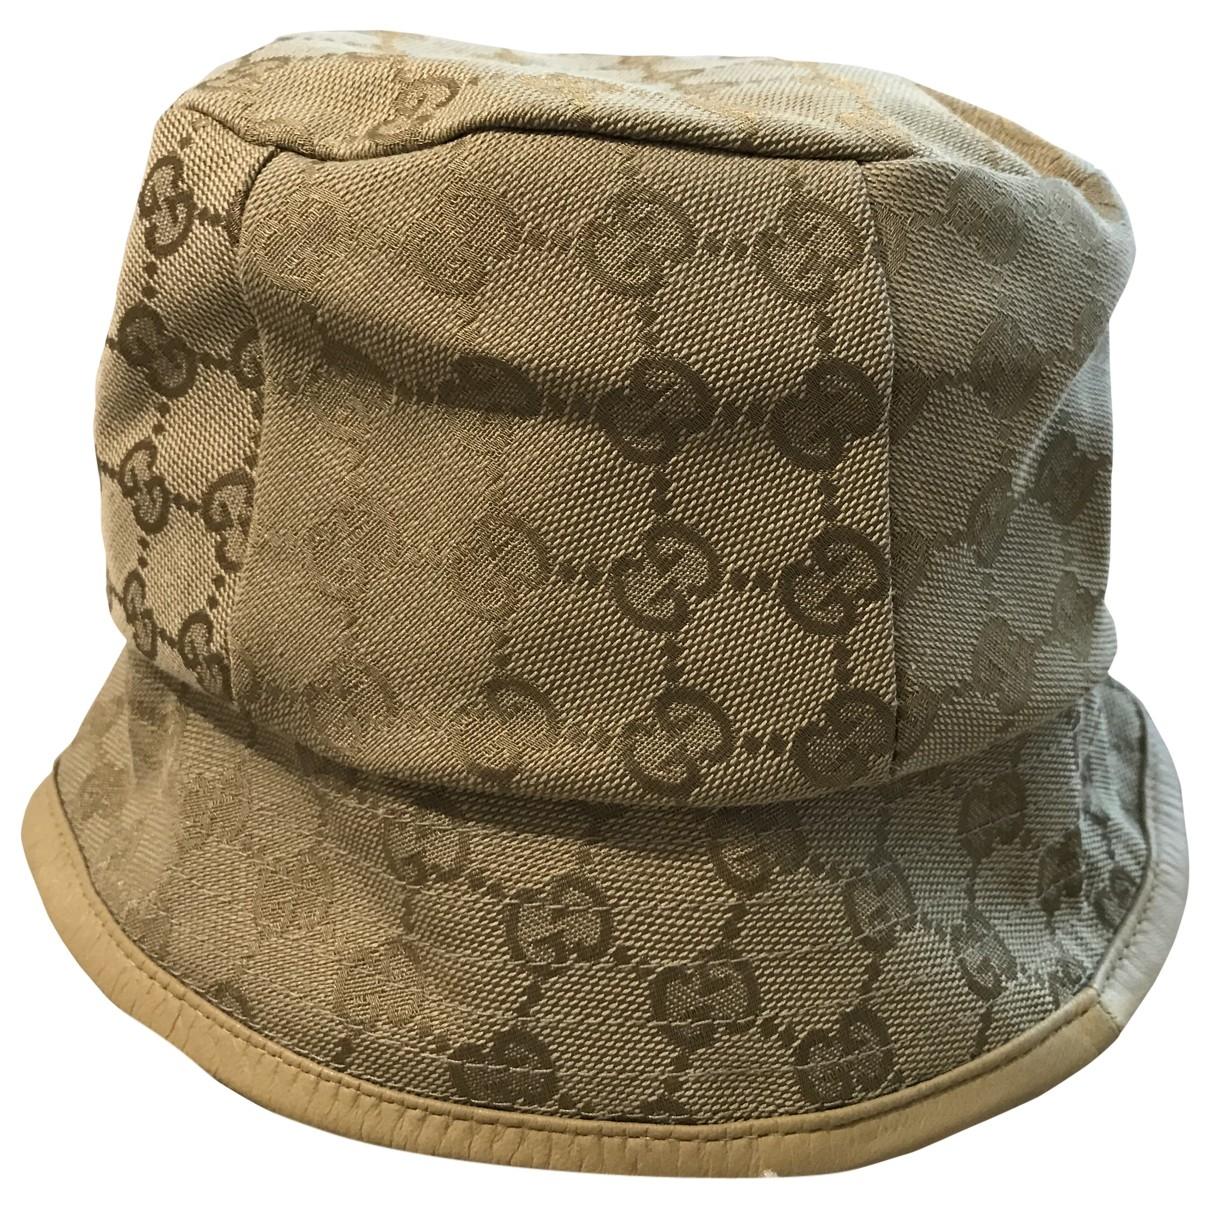 Gucci \N Beige Cloth hat for Women S International